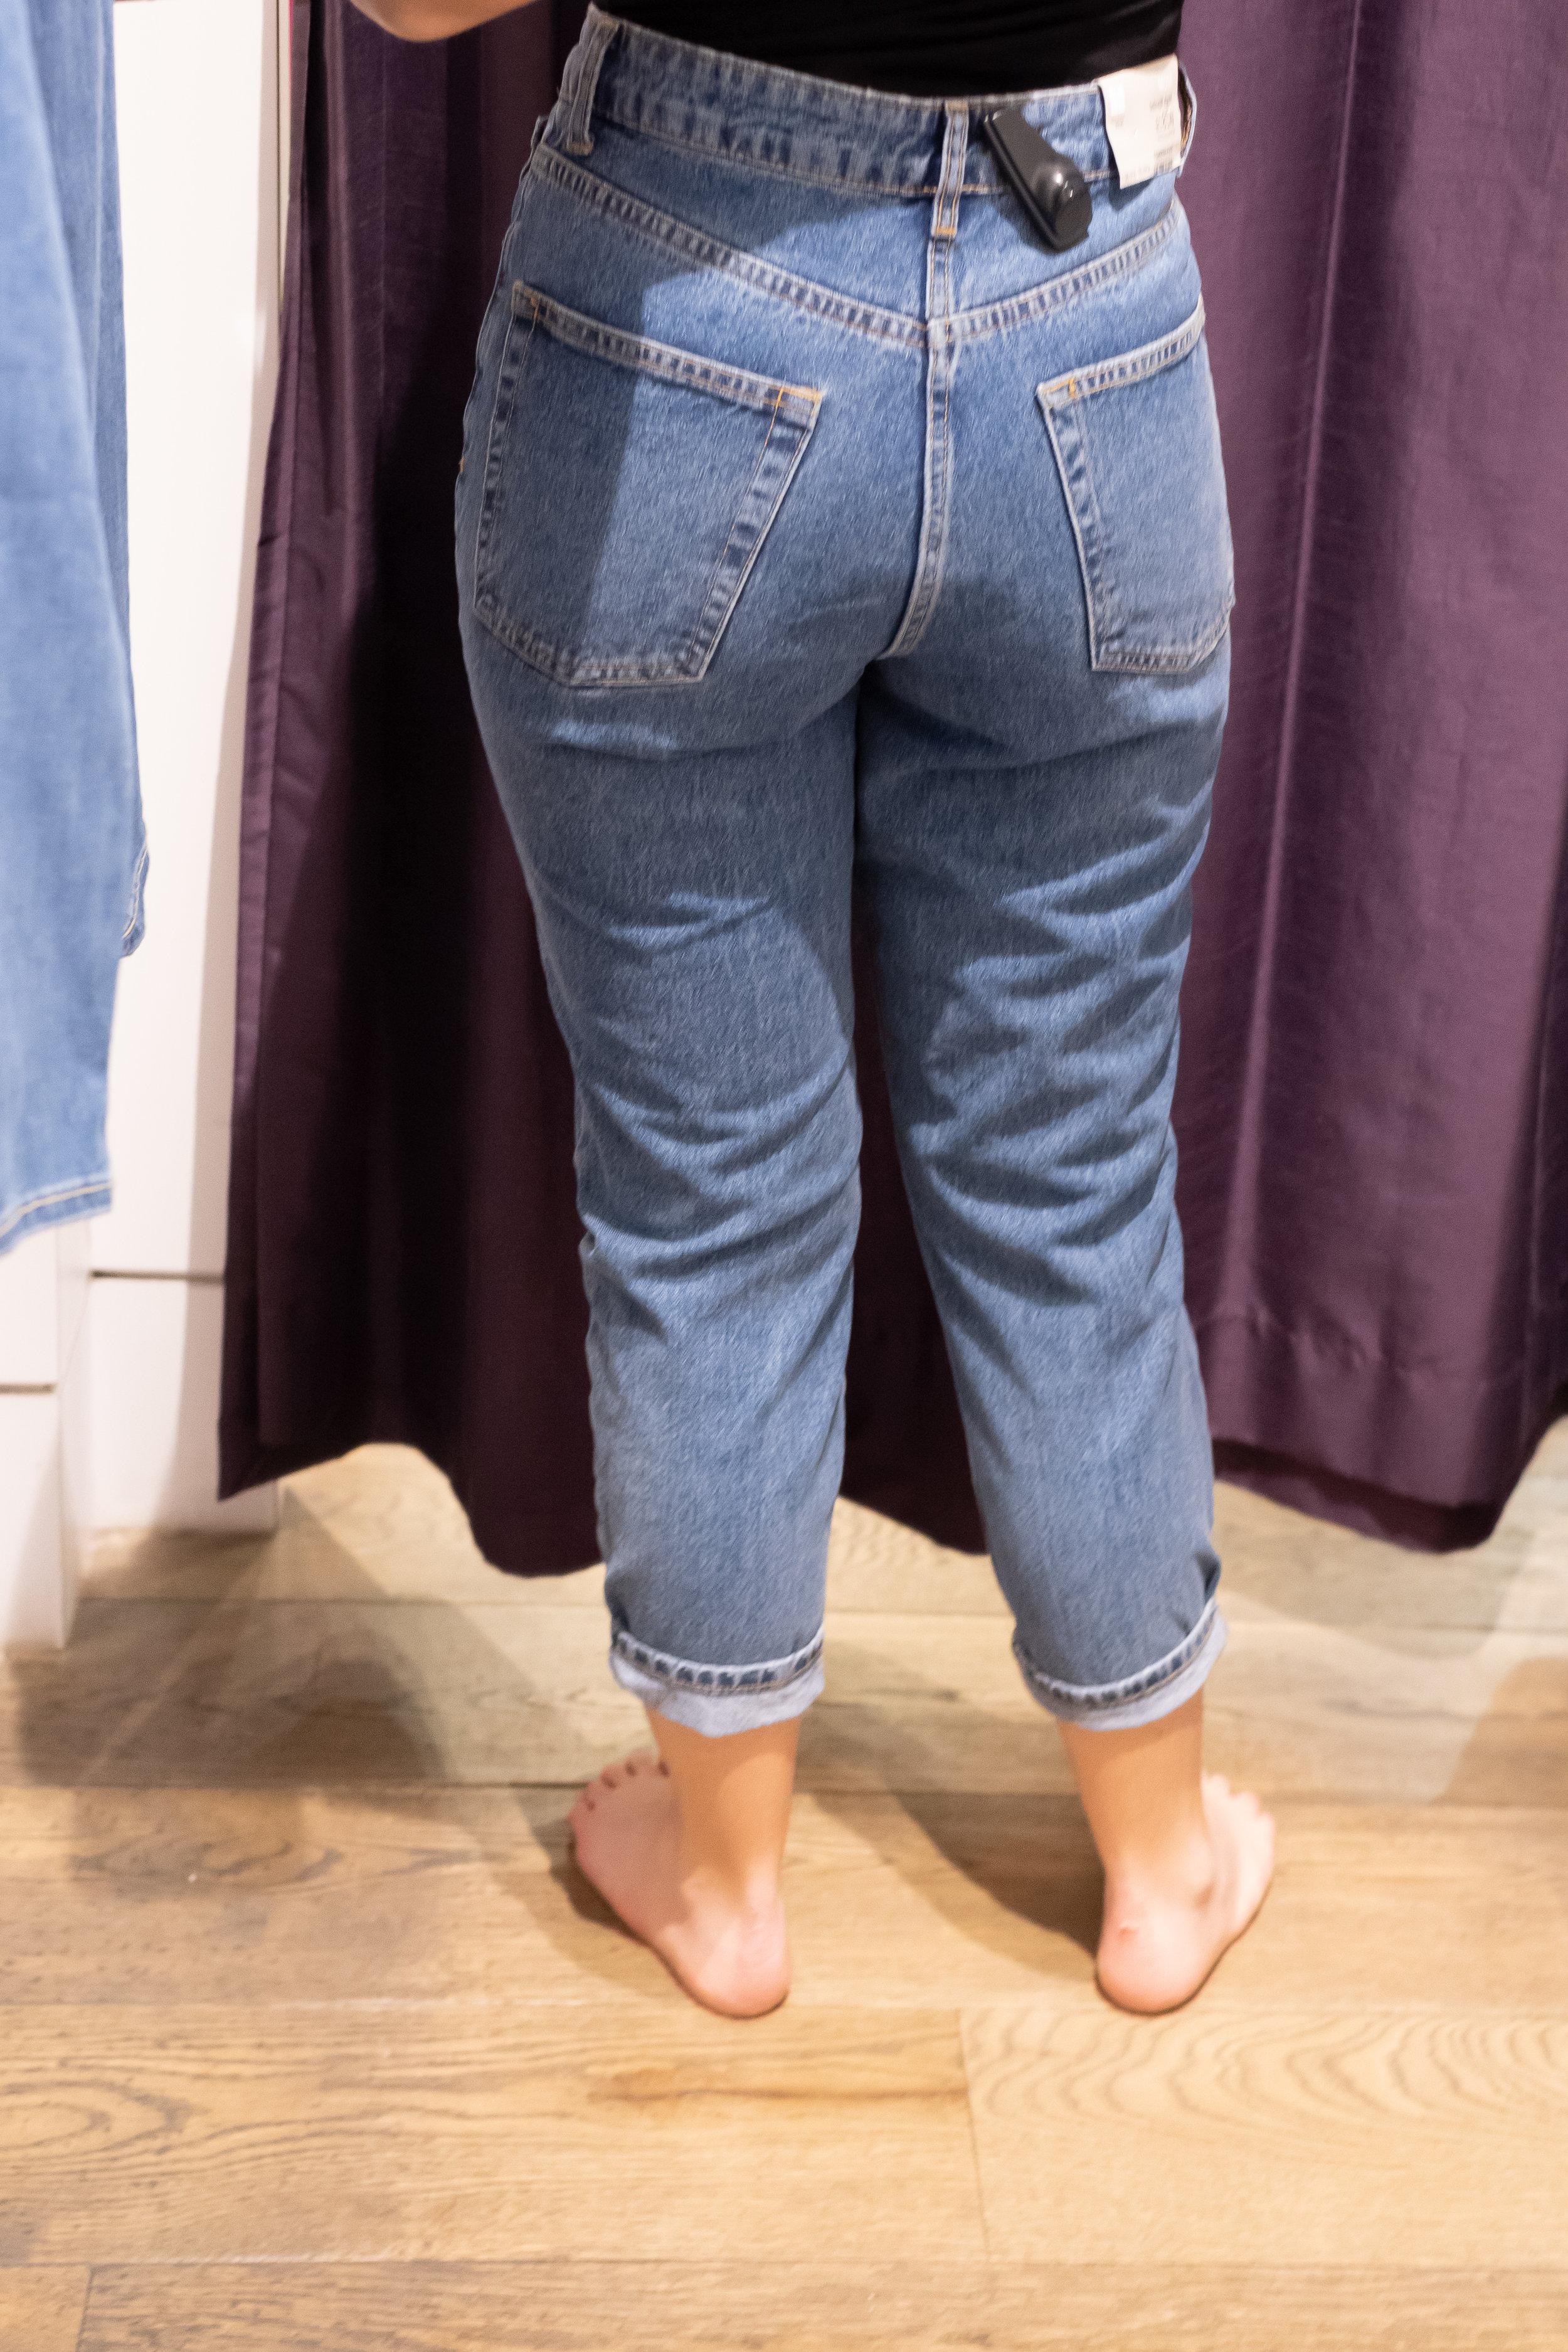 Topshop Petite Mom Jeans - Size 28 Petite - Back View